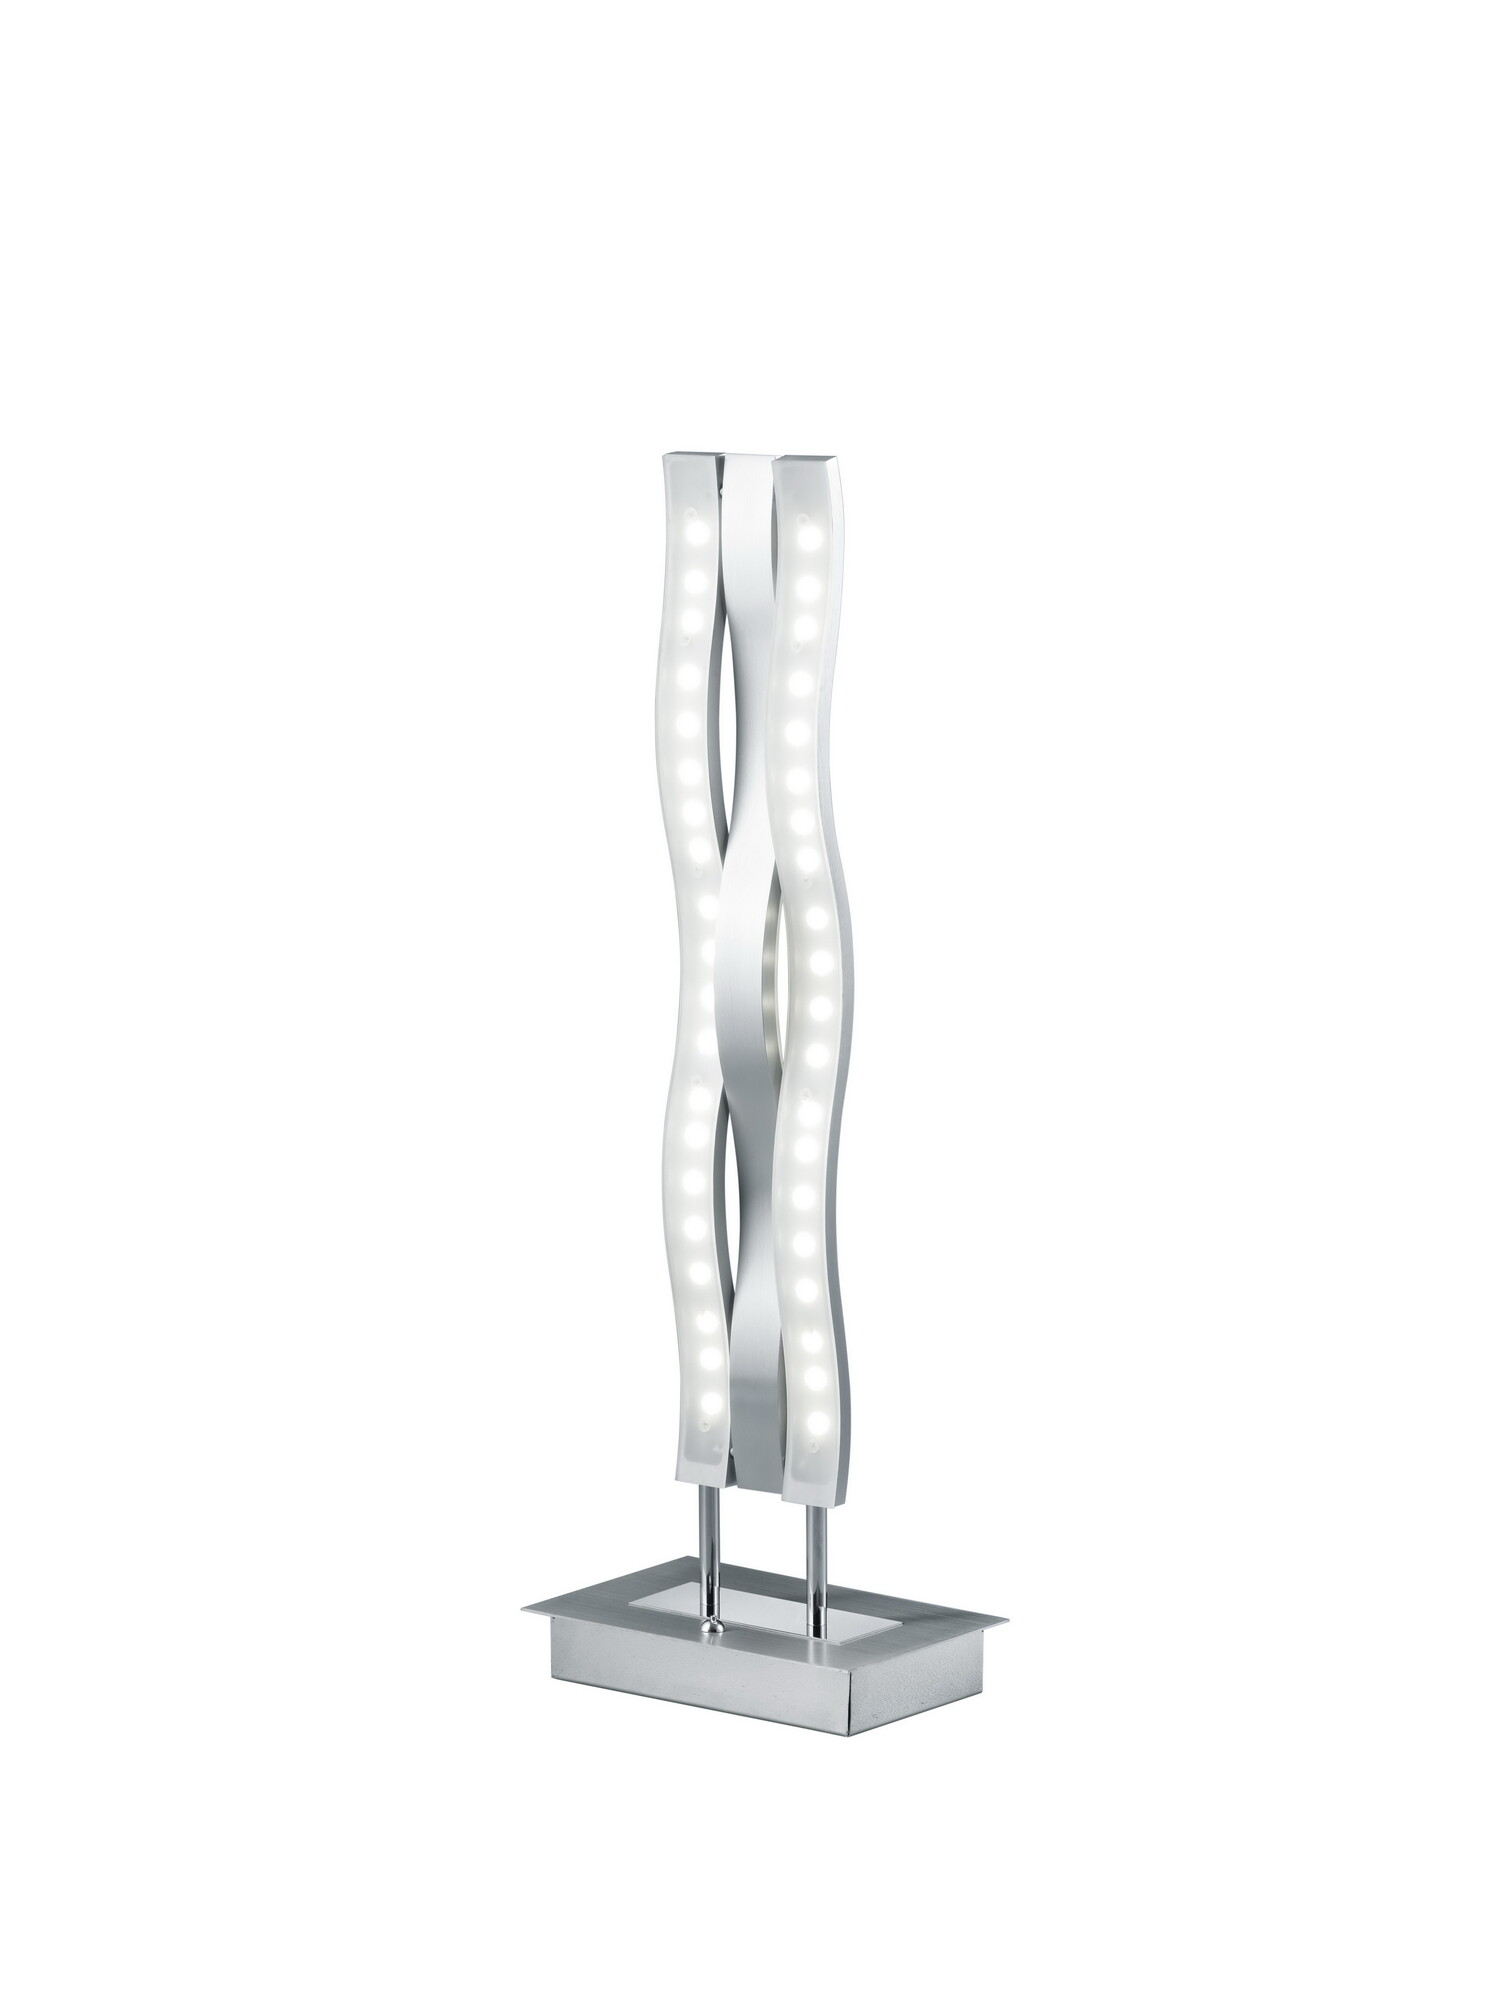 HELIOS2 Tafellamp LED 3x4W/1200lm Zilver